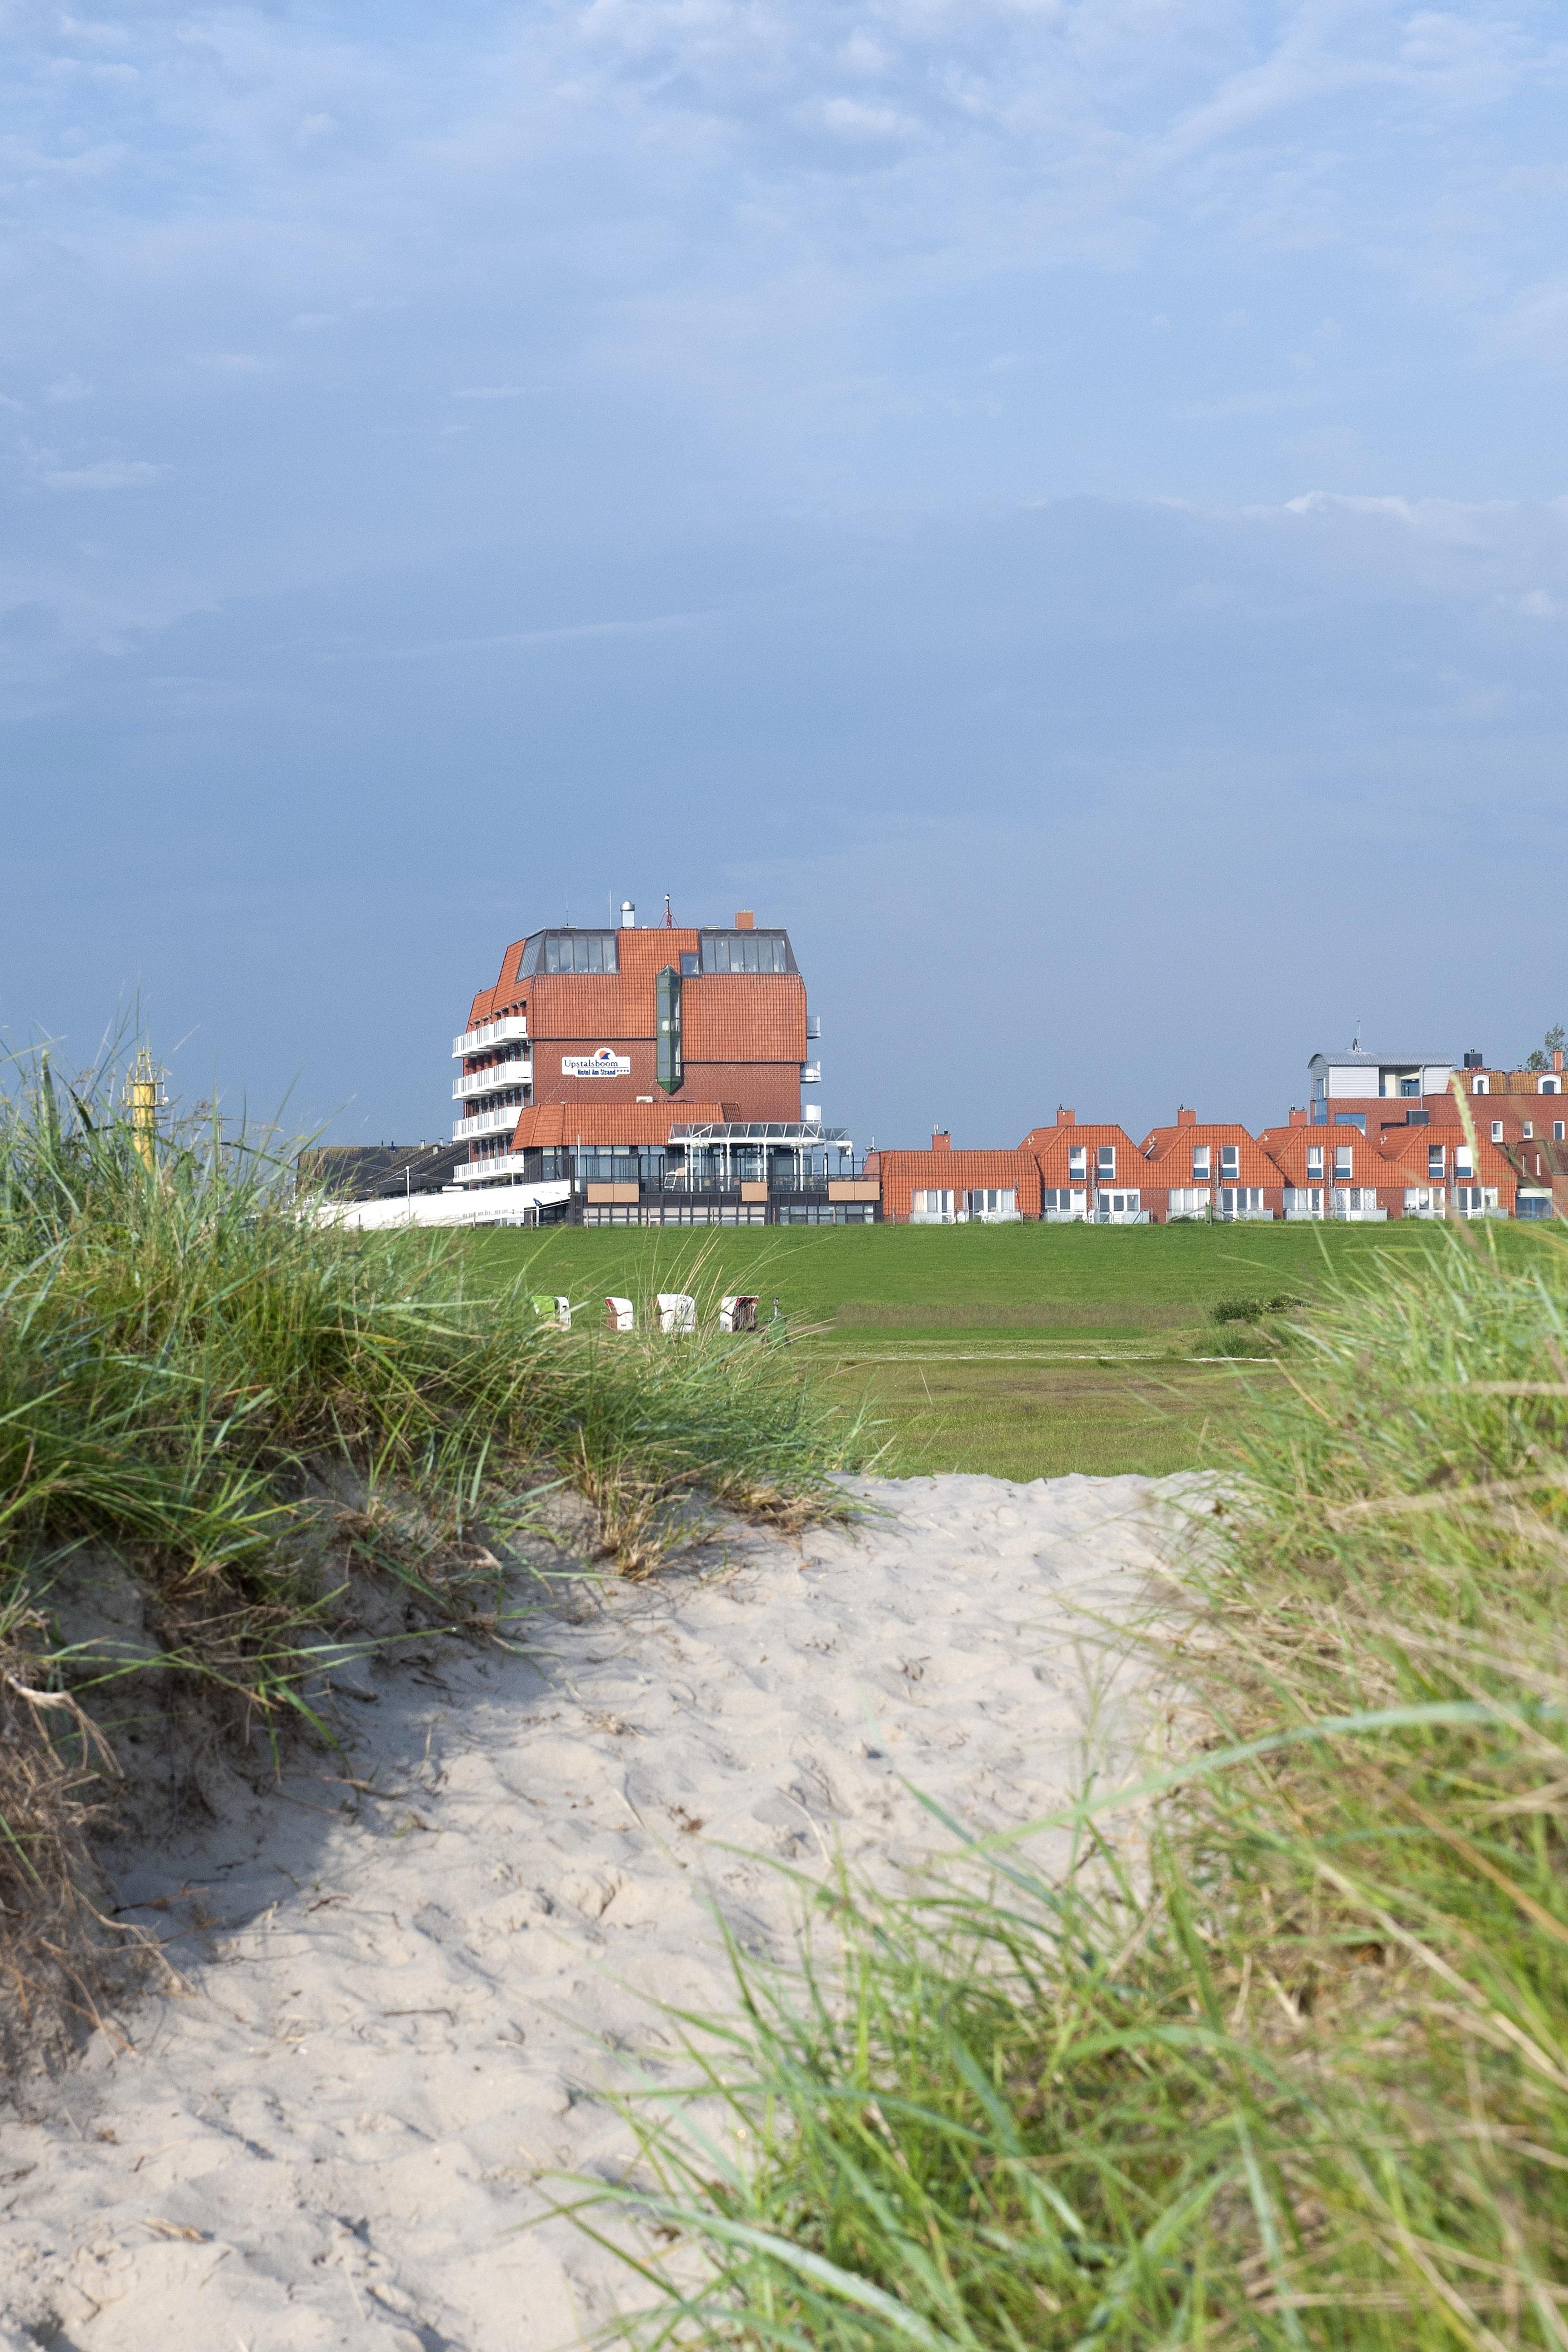 Upstalsboom Hotel Am Strand Wangerland Schillig 4